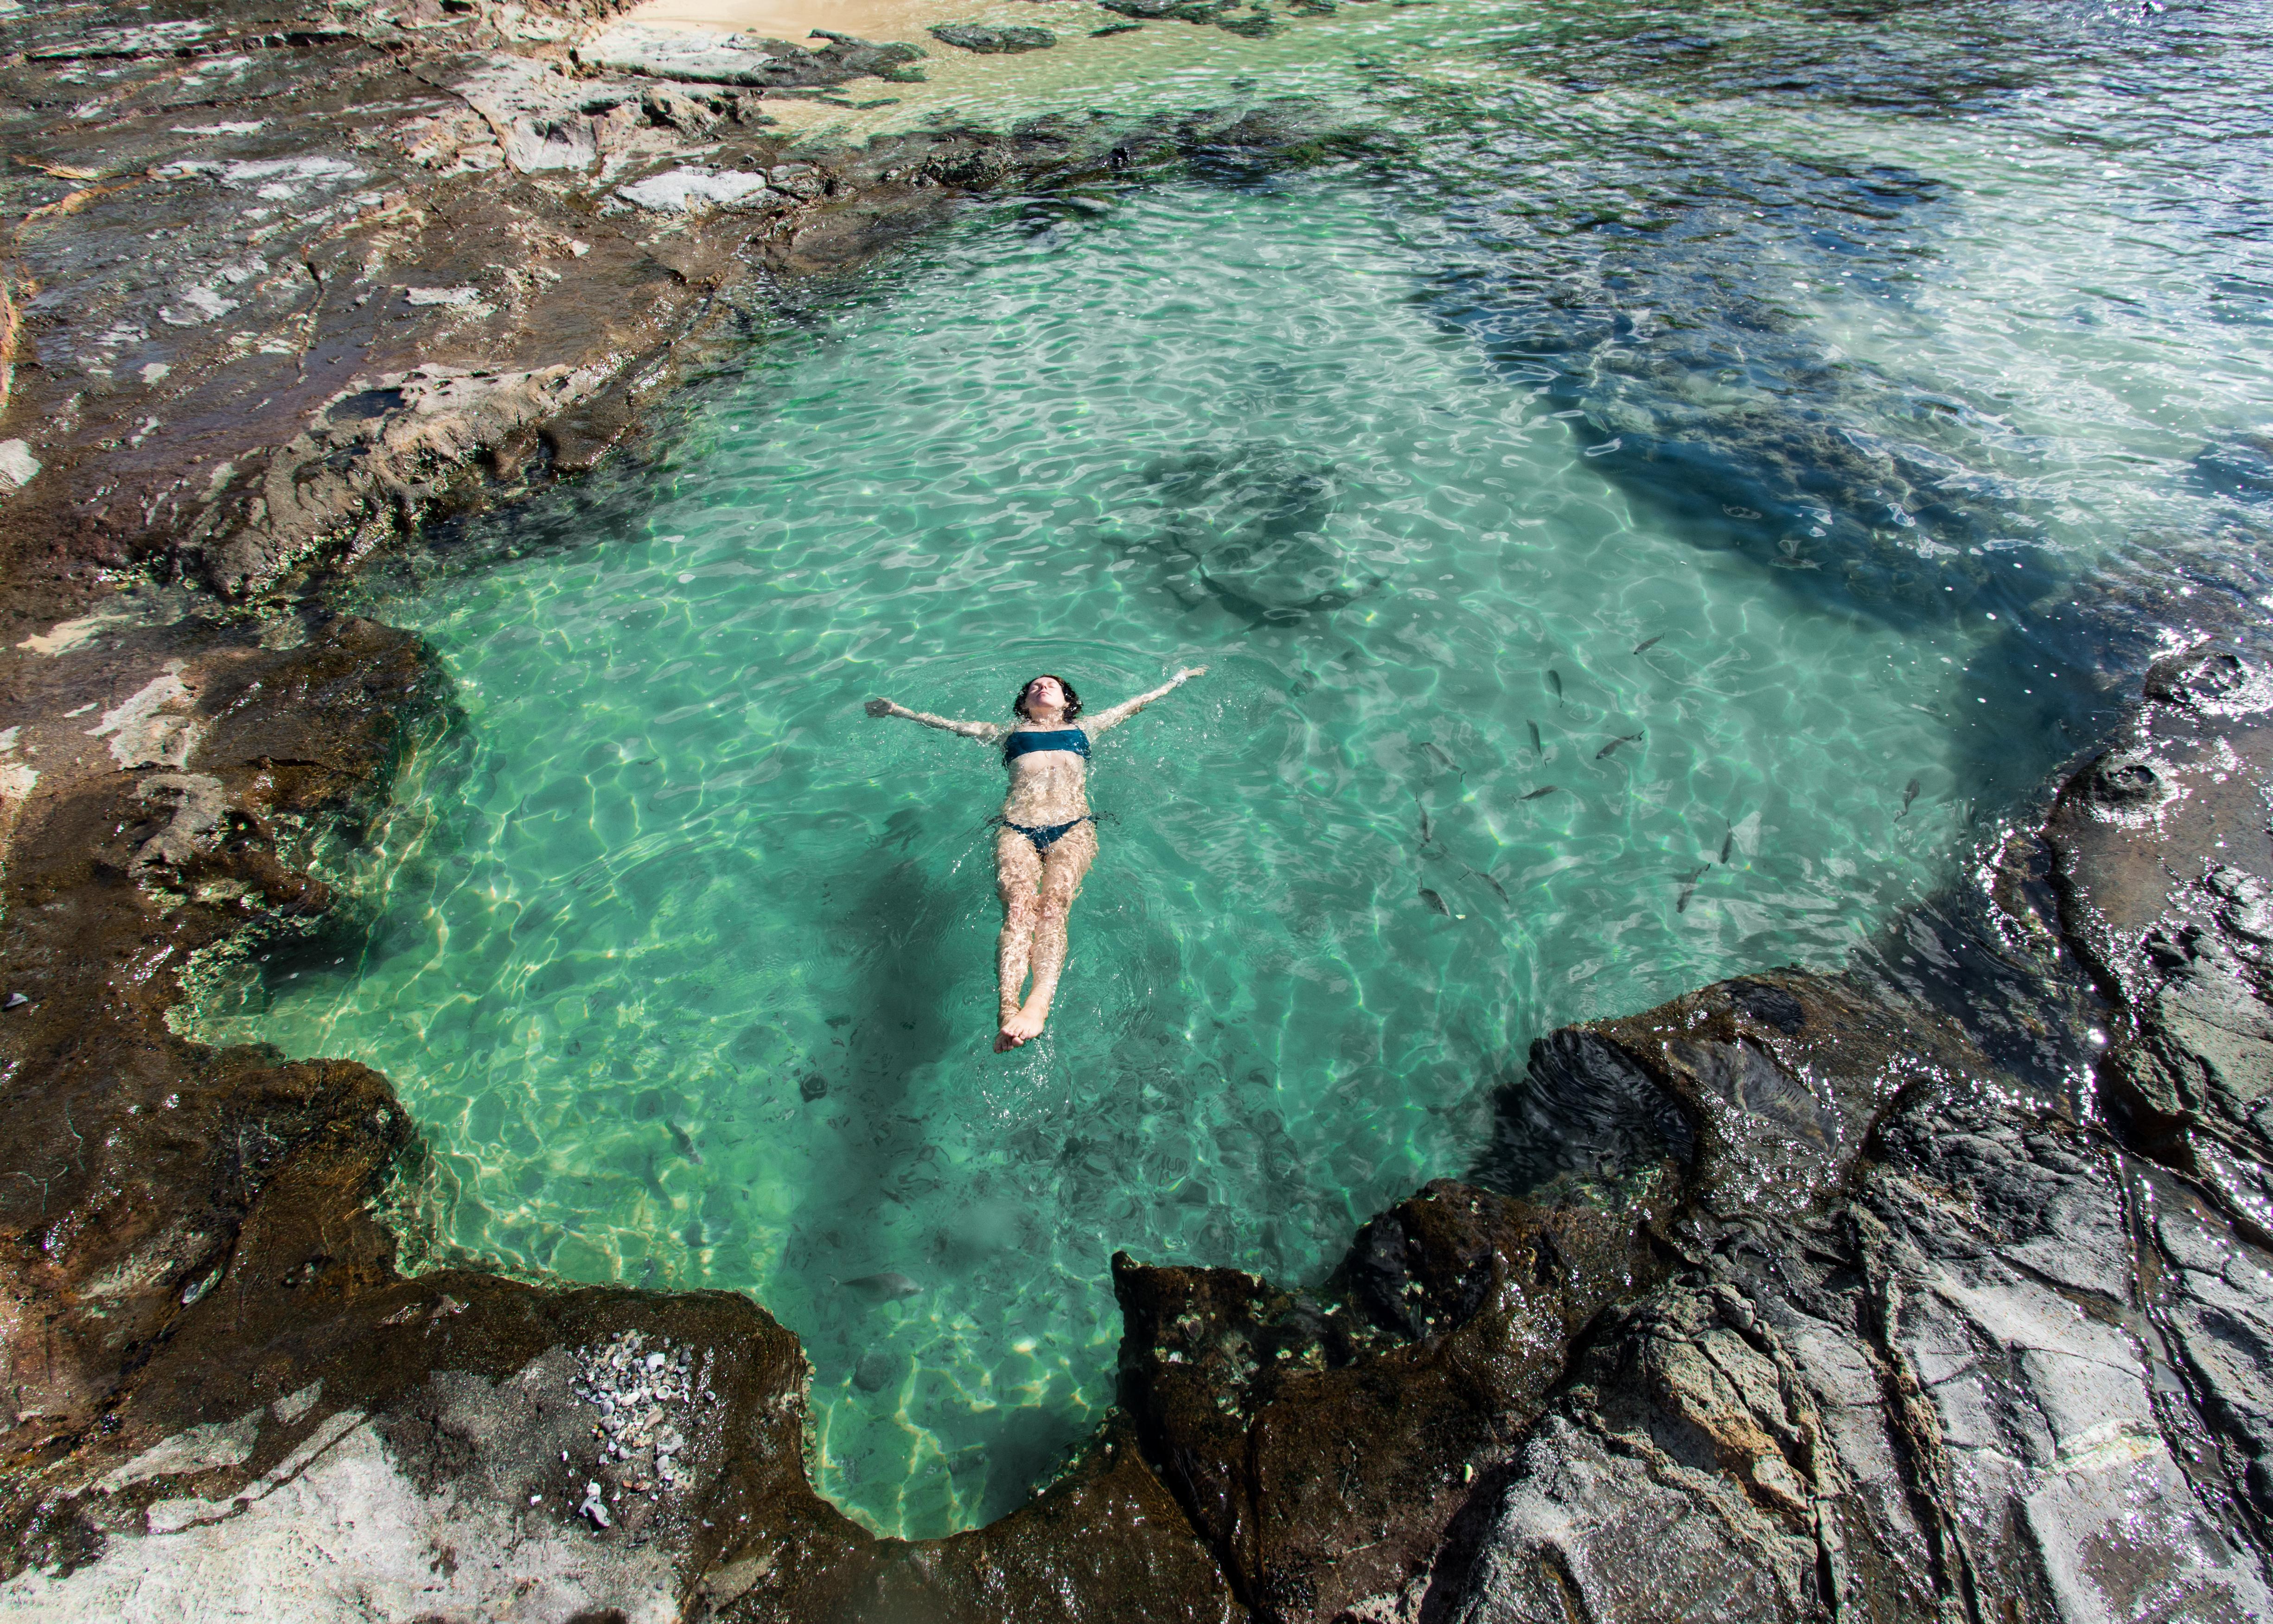 Fraser Island Champagne Pools